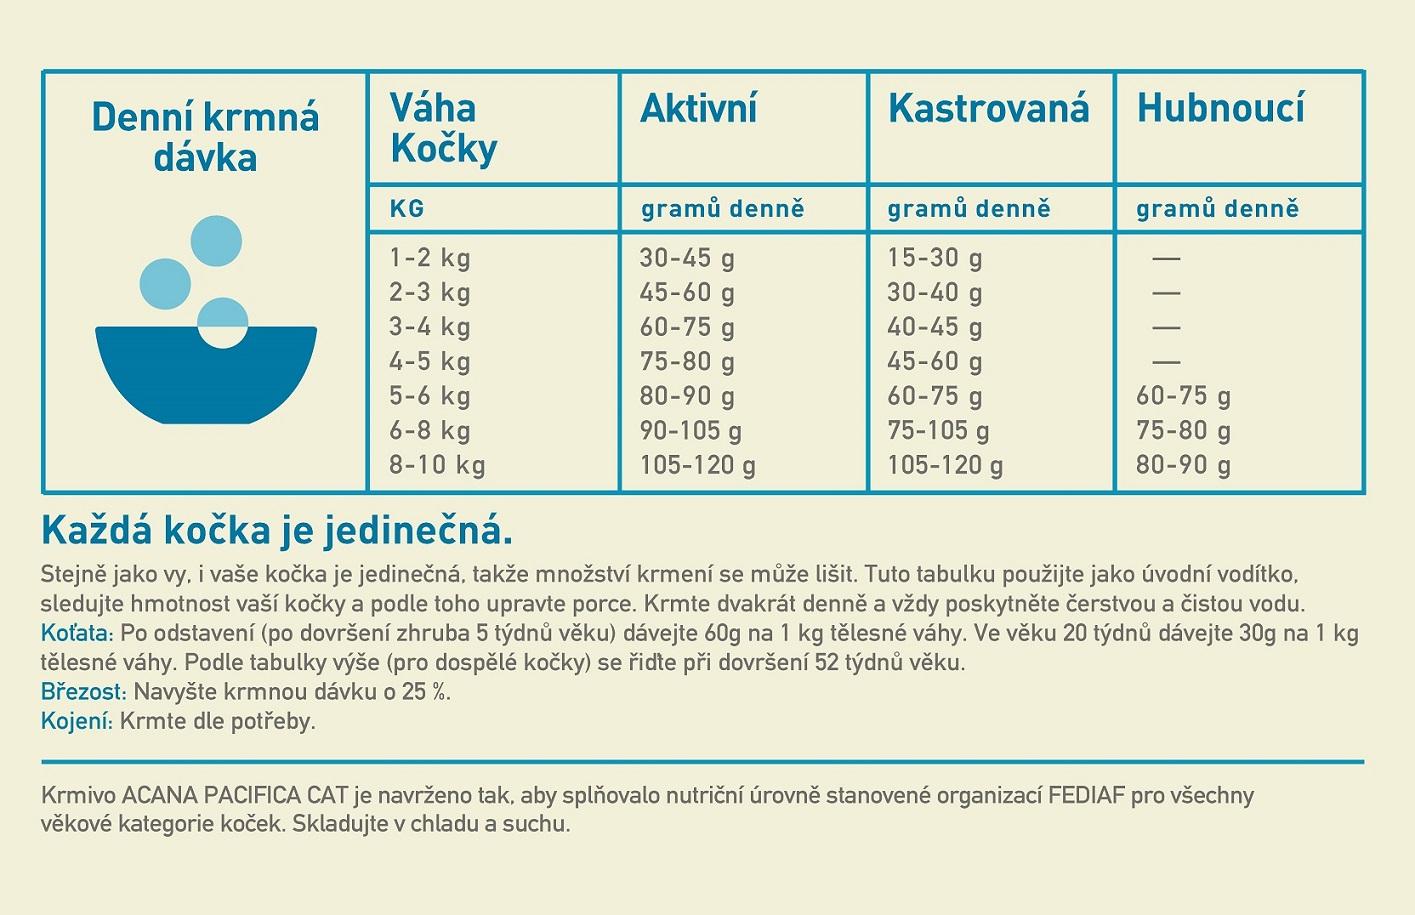 acana-cat-pacifica-1-8-kg-b